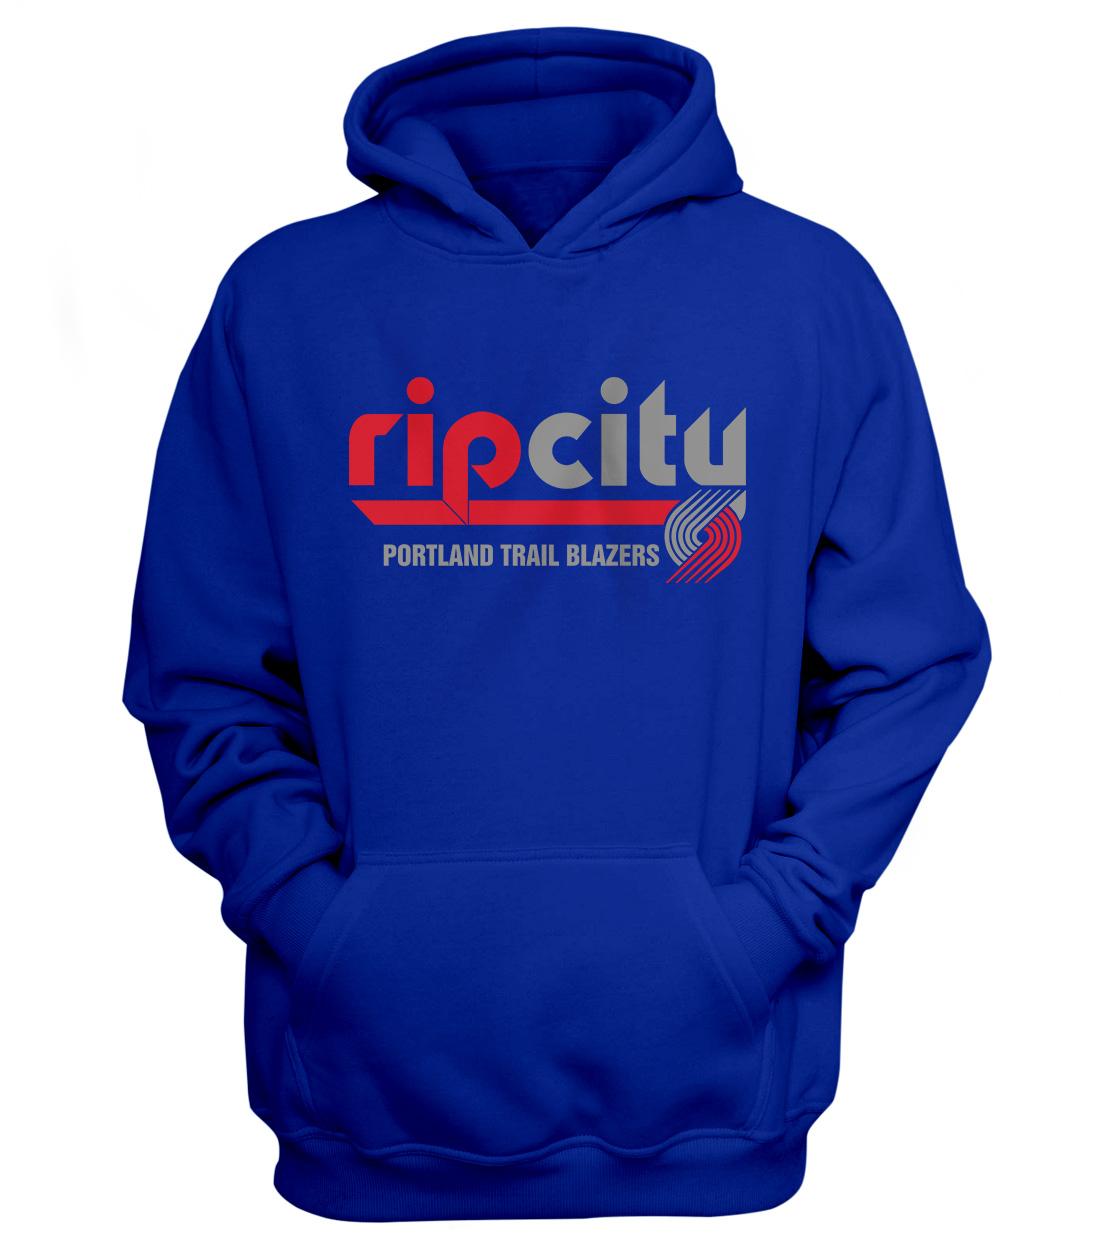 Portland Rip City Hoodie (HD-BLU-NP-190-NBA-POR-RIP.CITY)